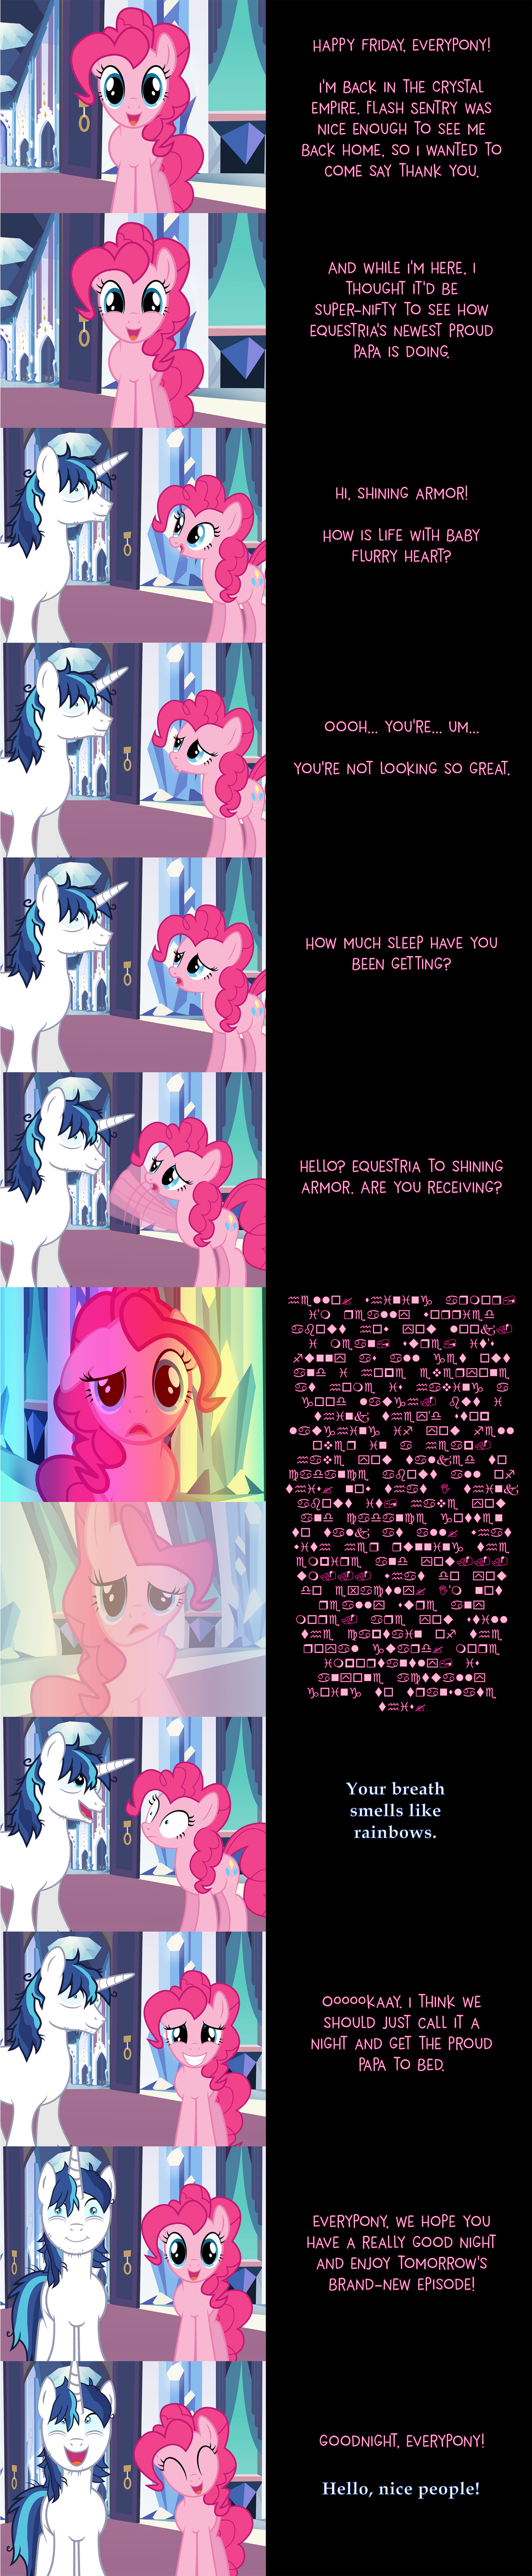 Pinkie Pie Says Goodnight: Sleepless